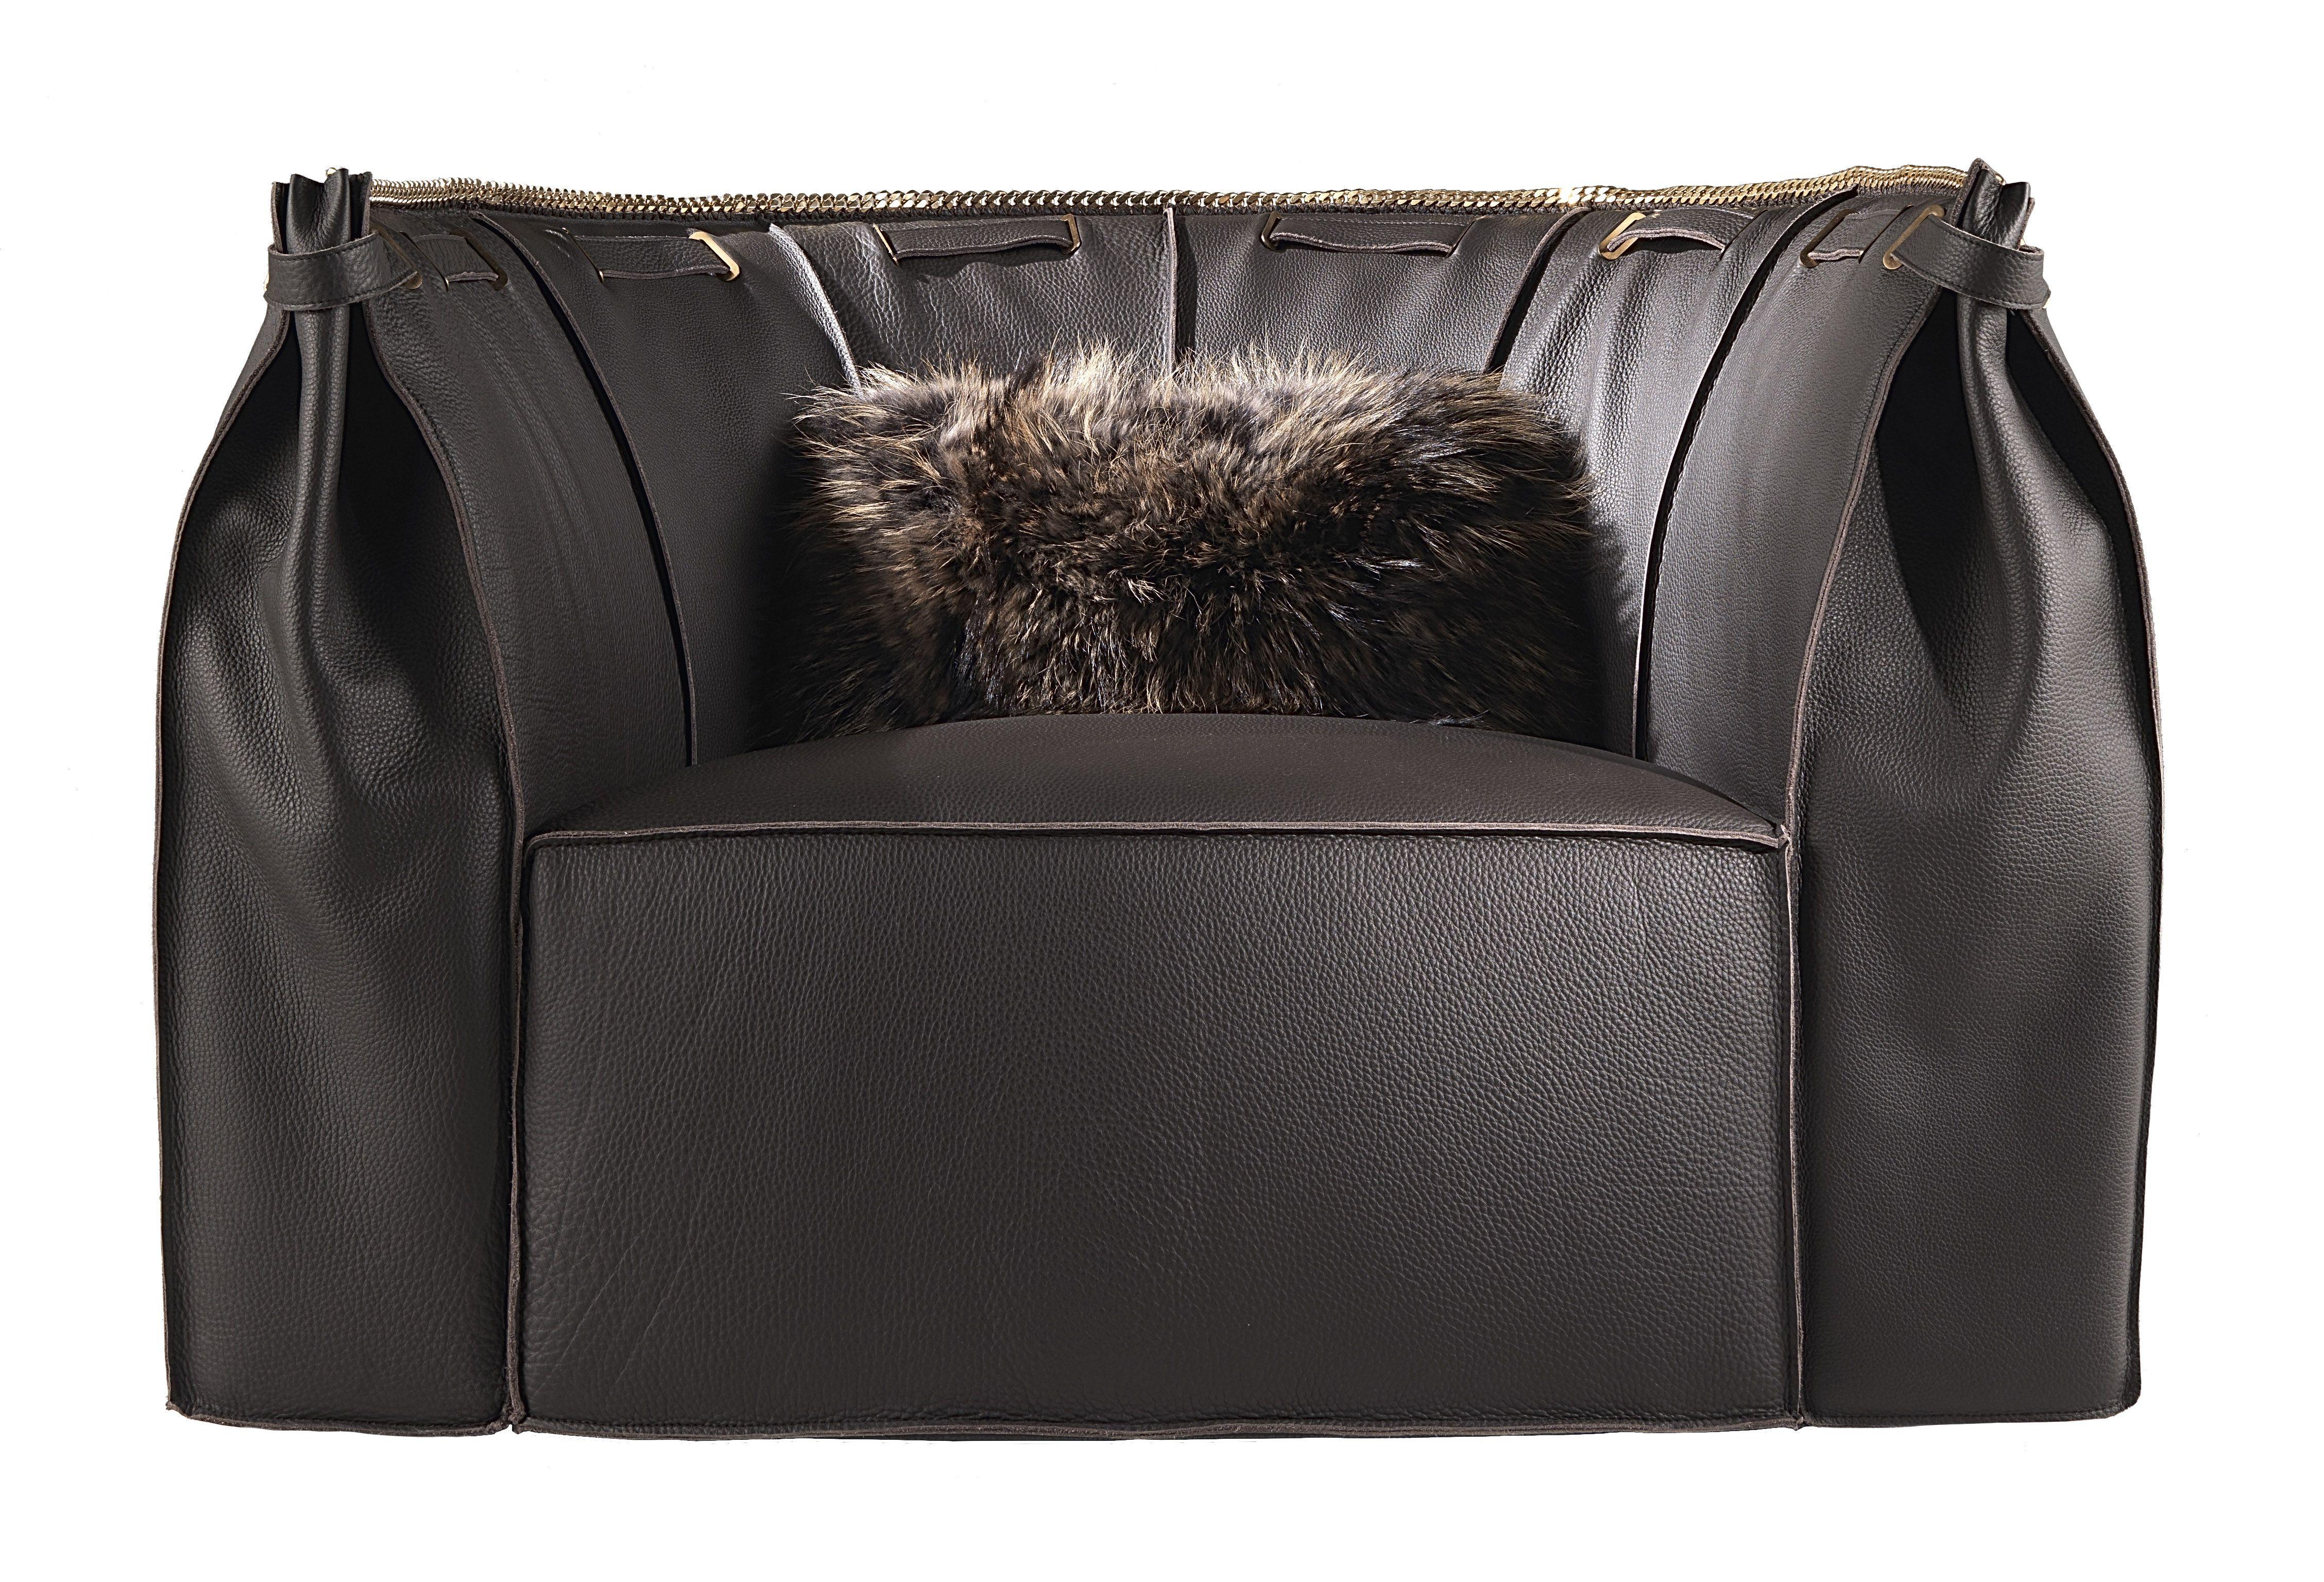 roberto cavalli florence armchair in brown furnituredesign